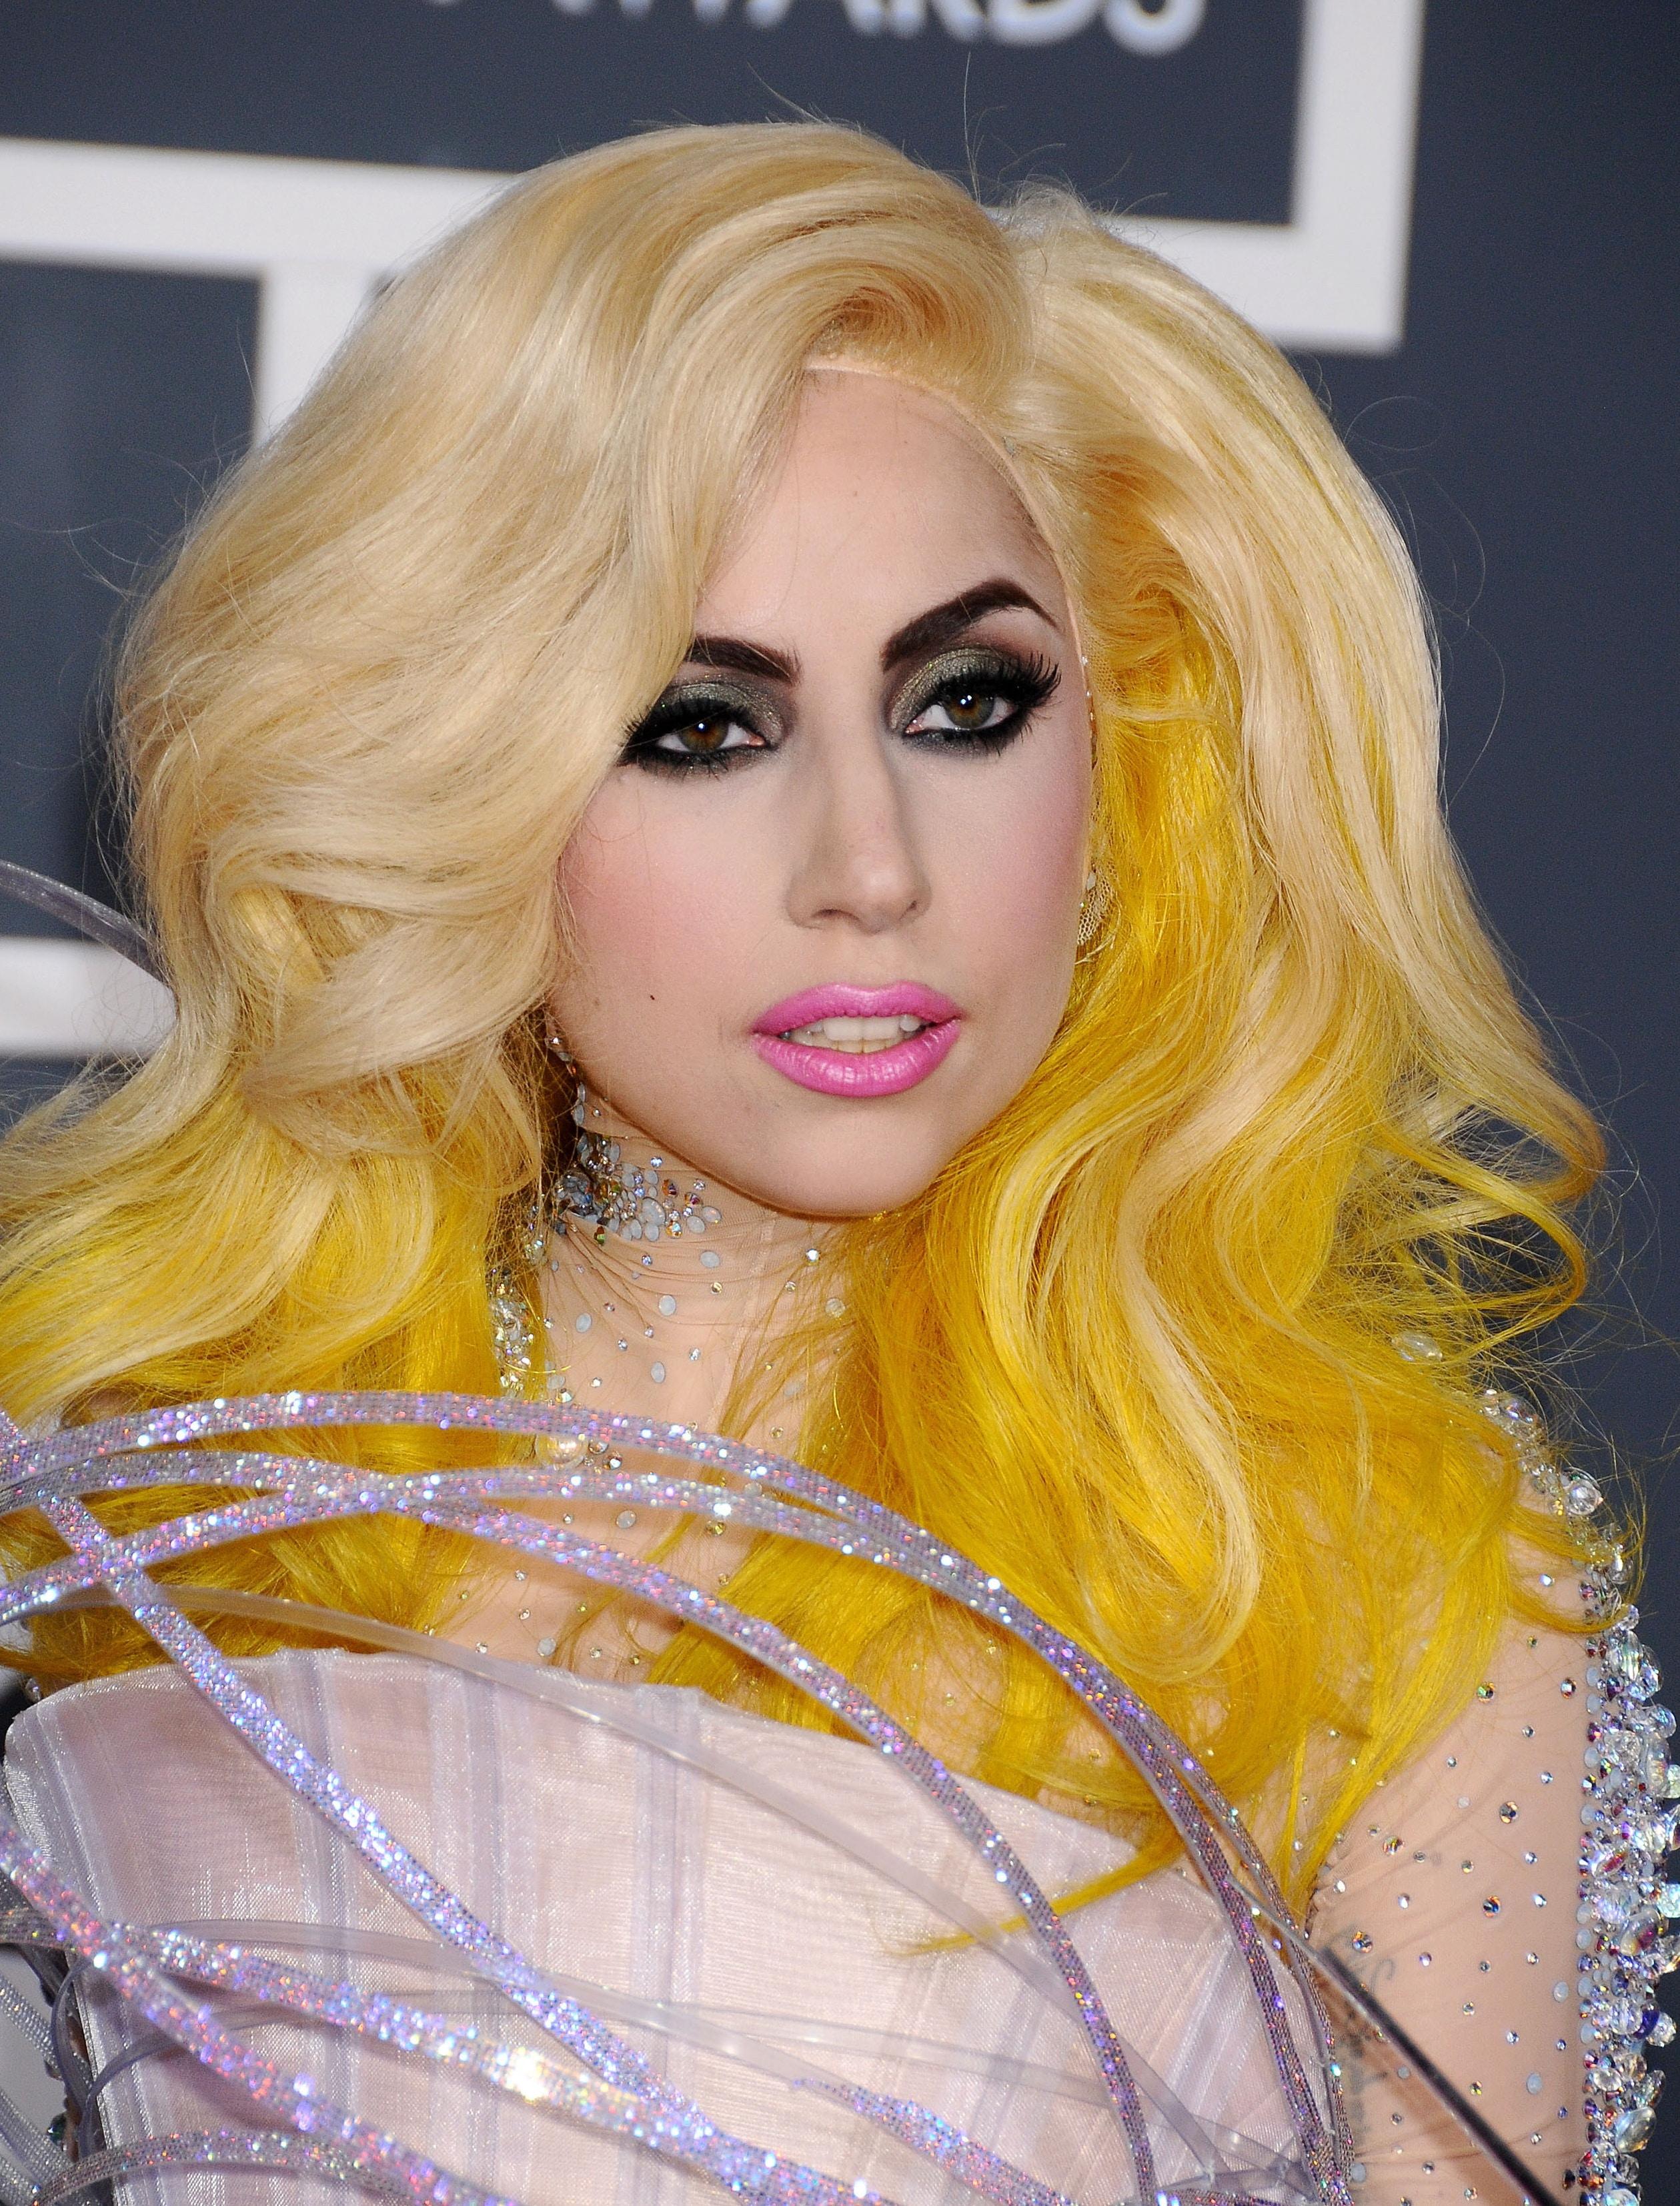 Lady Gaga Net Worth 2017-2016, Biography, Wiki - UPDATED ...